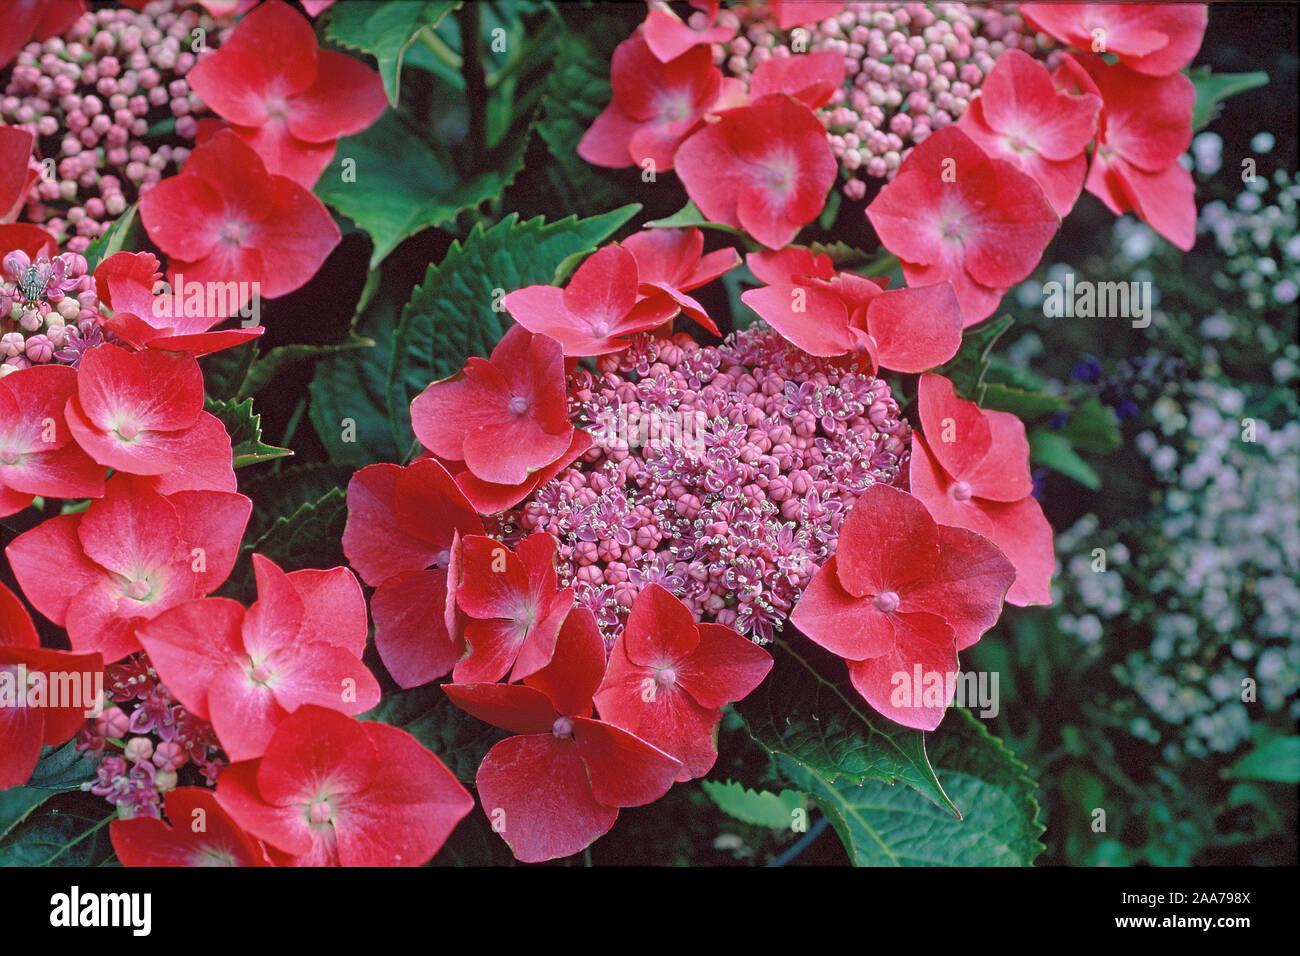 Gartenhortensie, Hydrangea macrophylla Kardinal Stock Photo